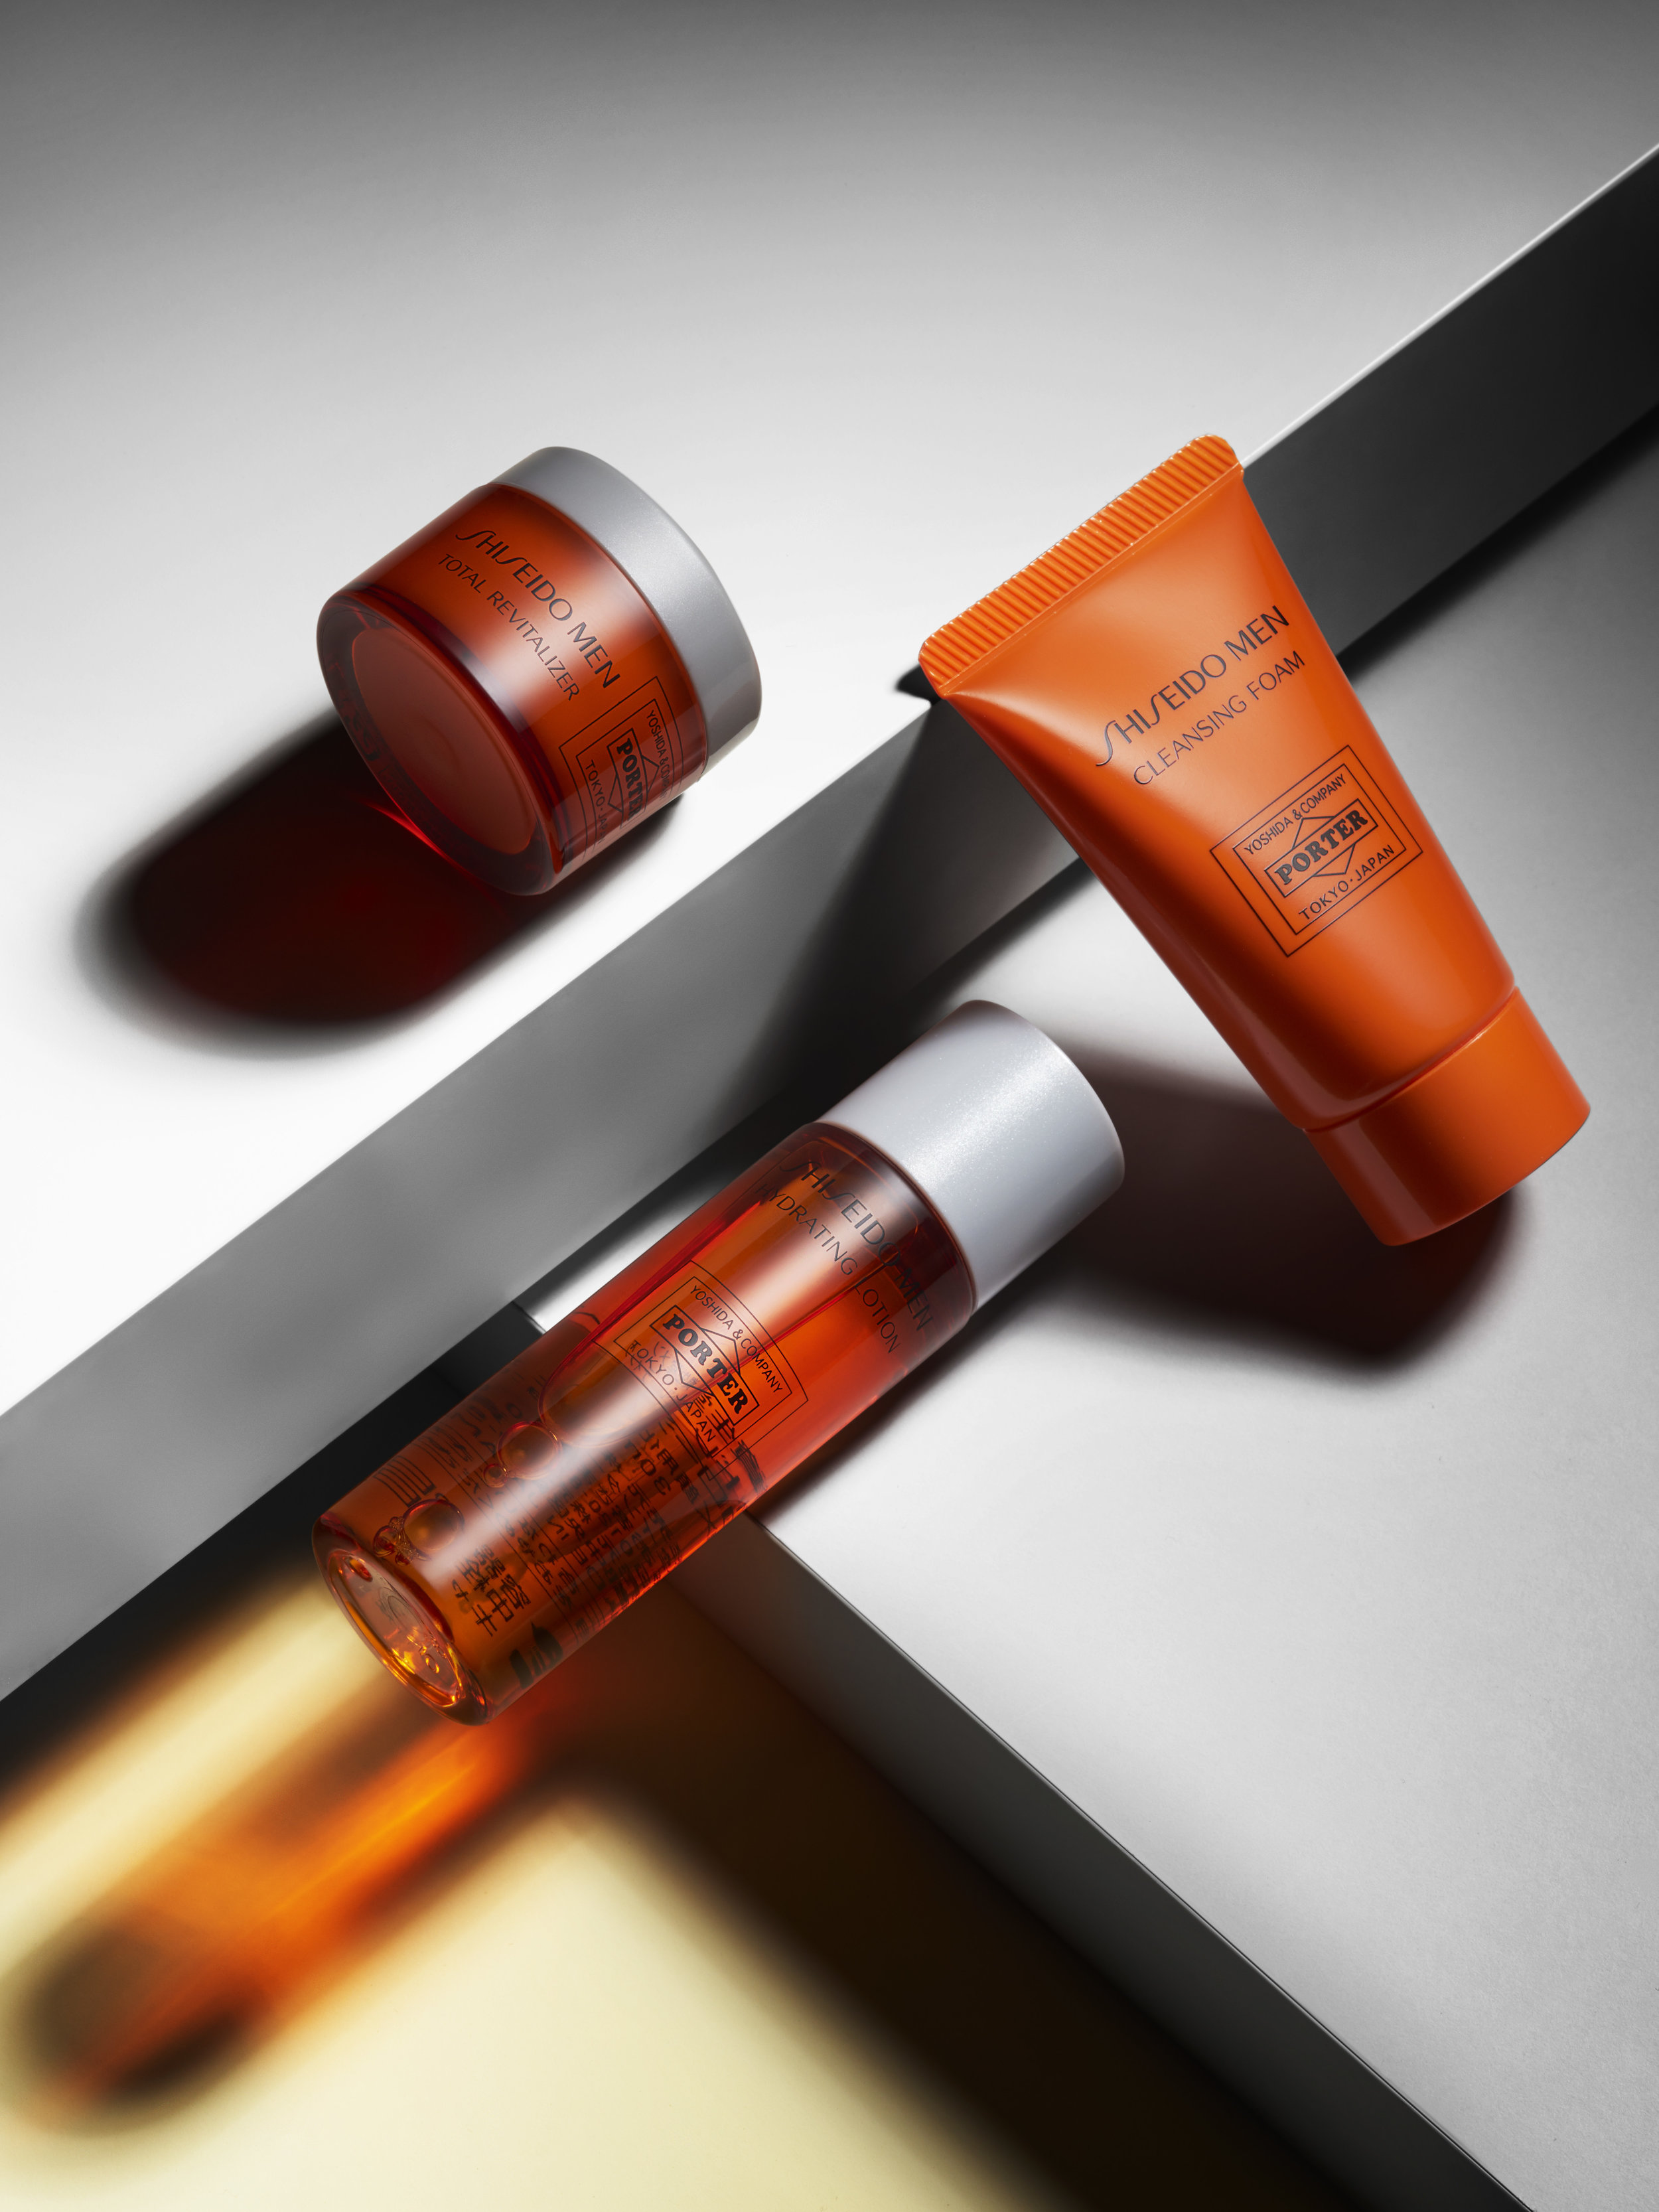 170104_Shiseido Mens Orange_0214_A.jpg